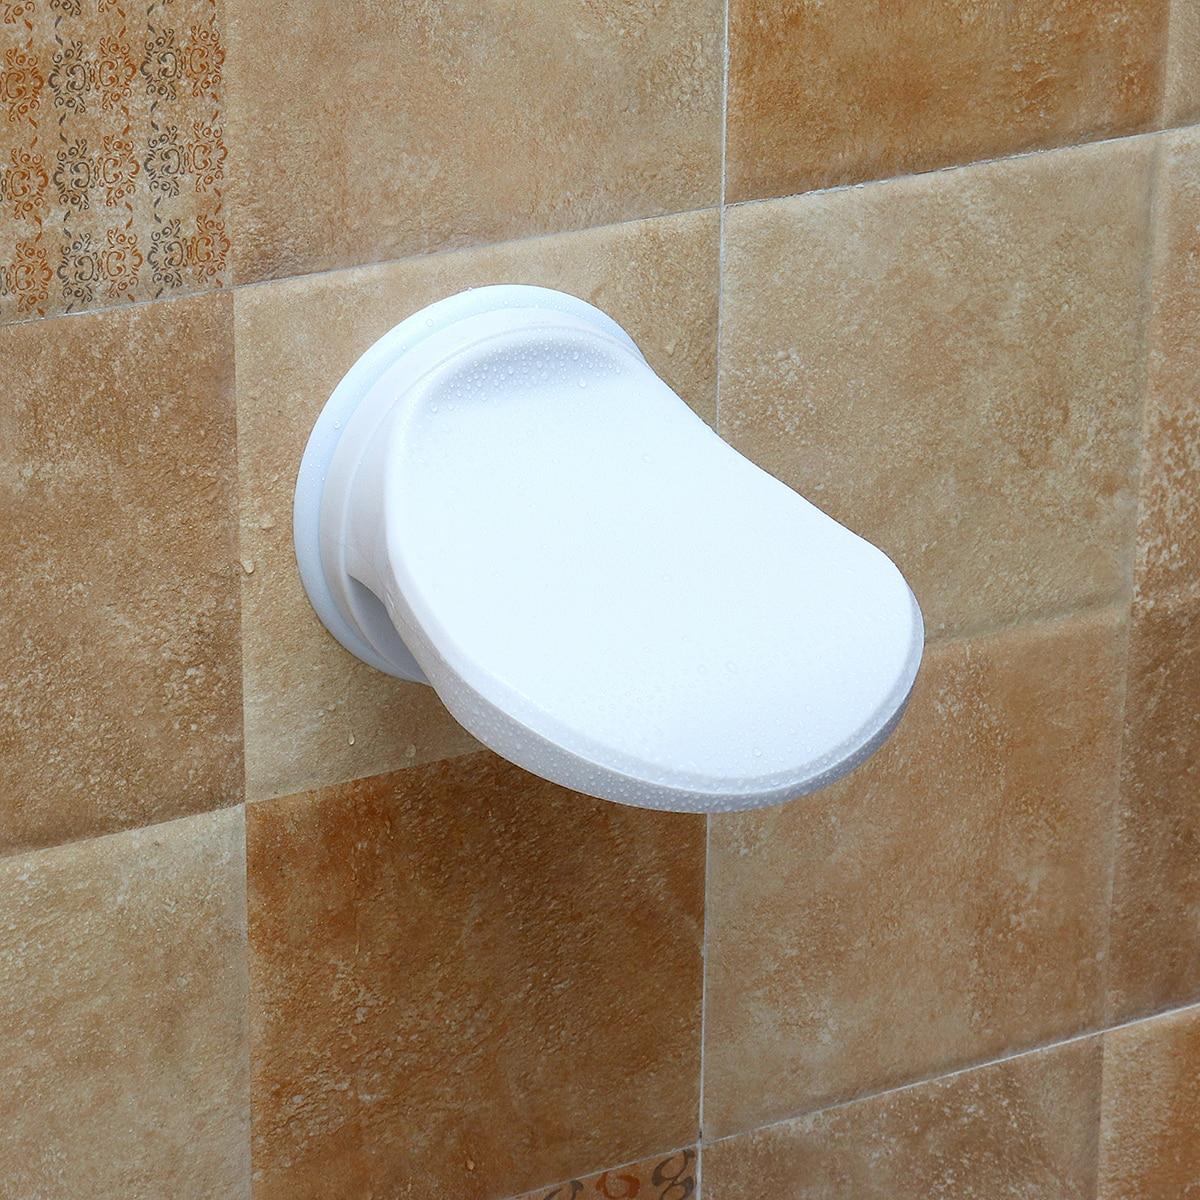 Bathroom Shower Foot Rest Shaving Leg Step Aid Grip Holder Pedal ...